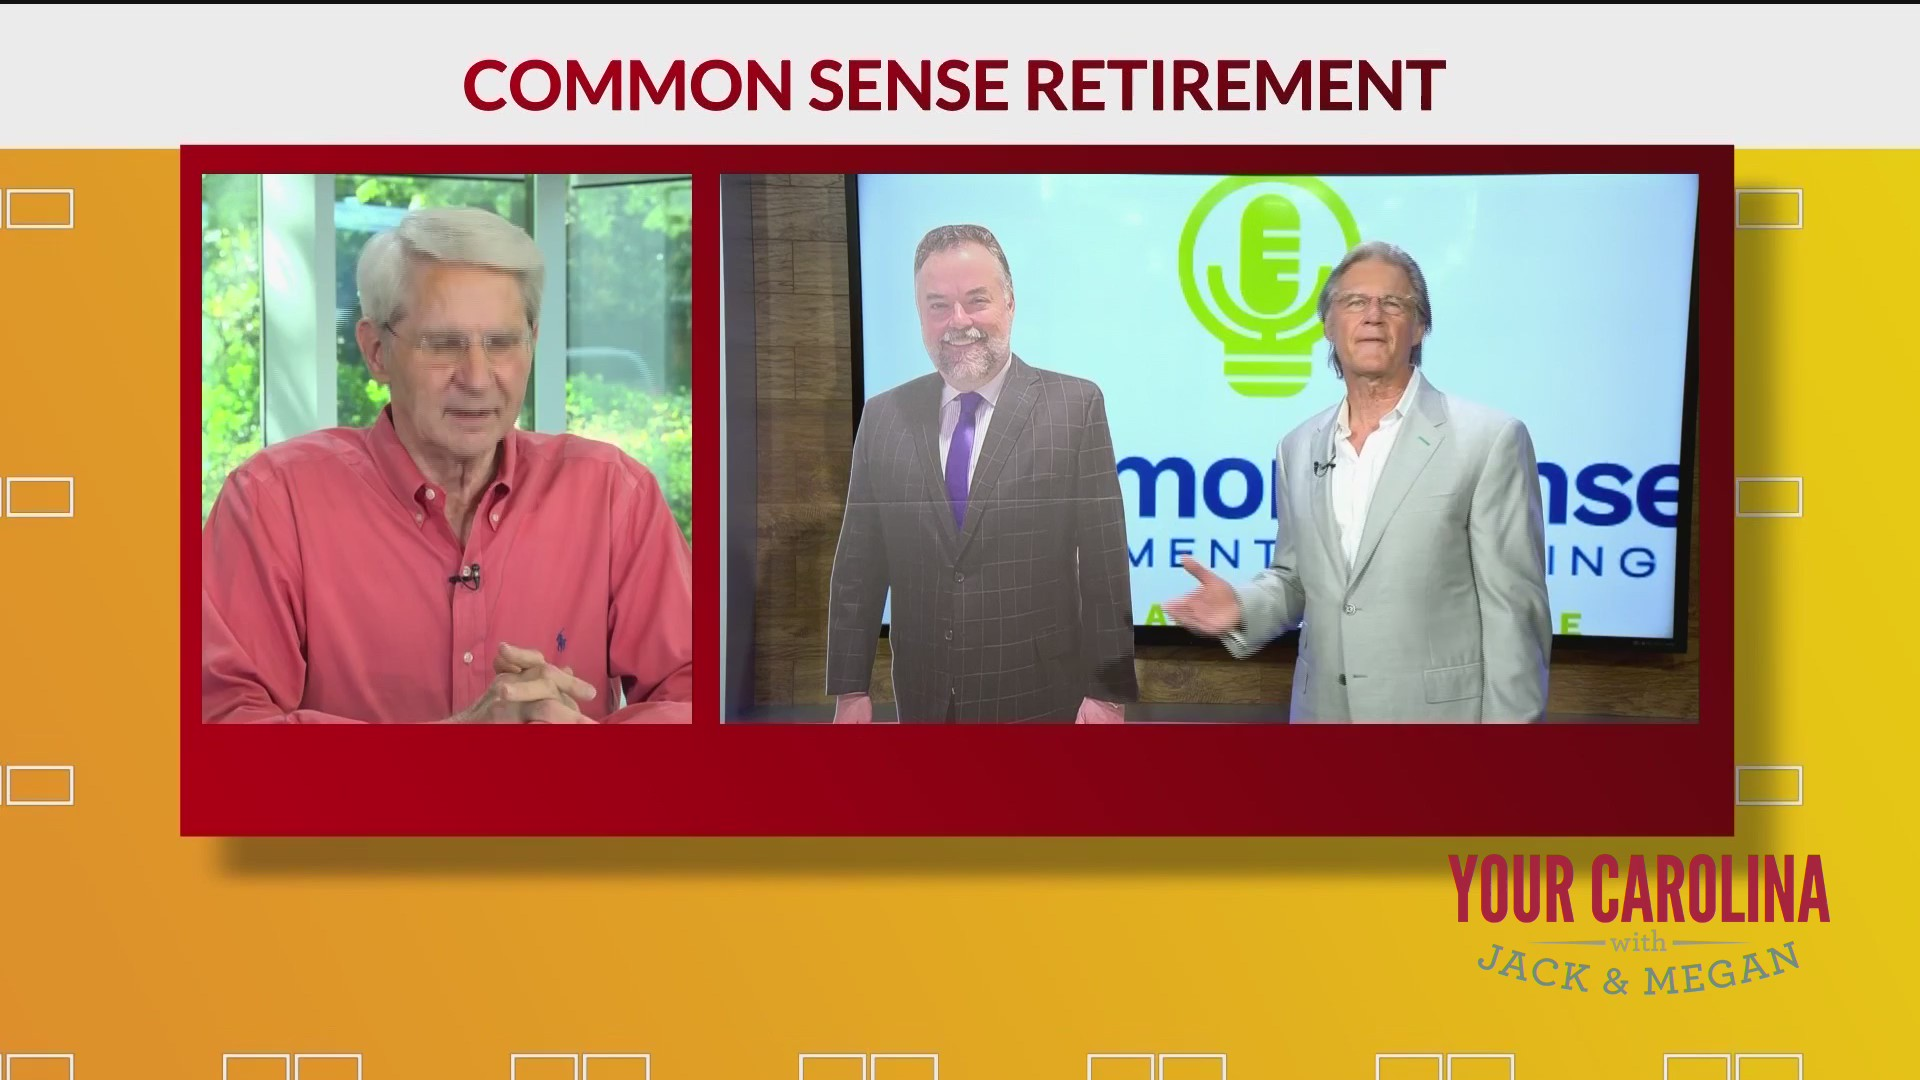 CommonSense Retirement